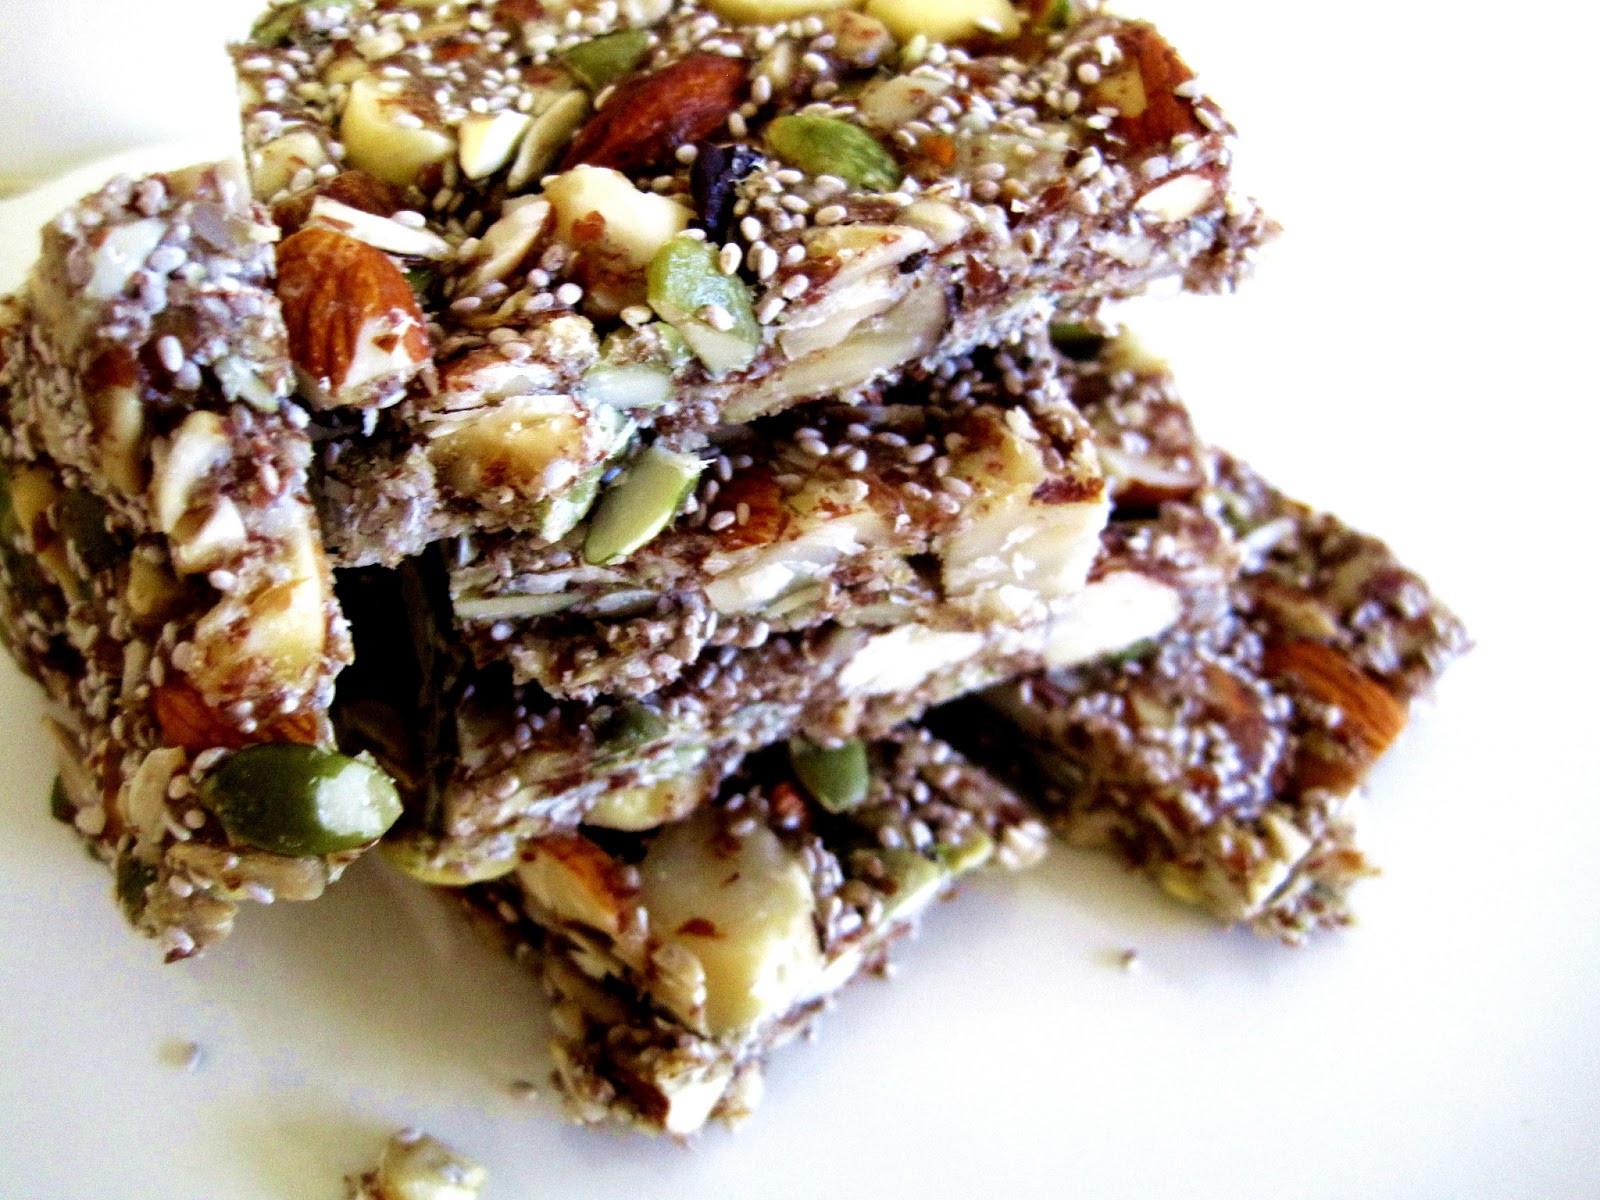 Healthy Raw Snacks  Raw Snacks Honey Nut Raw Bars Recipe Raw Recipes with